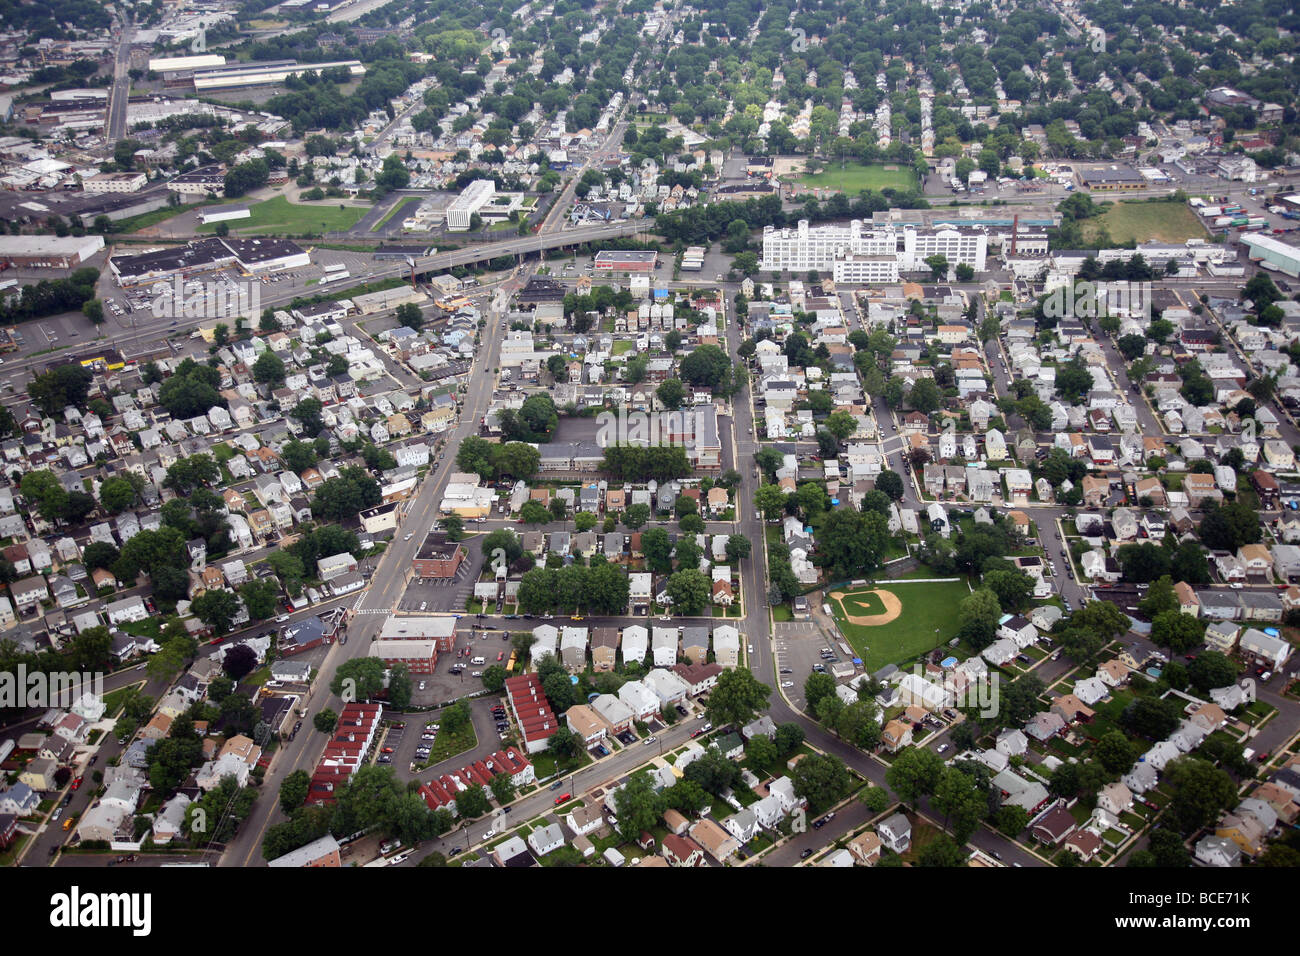 Luftbild des Hang, Union County NJ USA, Amerika, Vereinigte Staaten von Amerika Liberty Ave Autobahn RT. 22, Bristol Stockbild